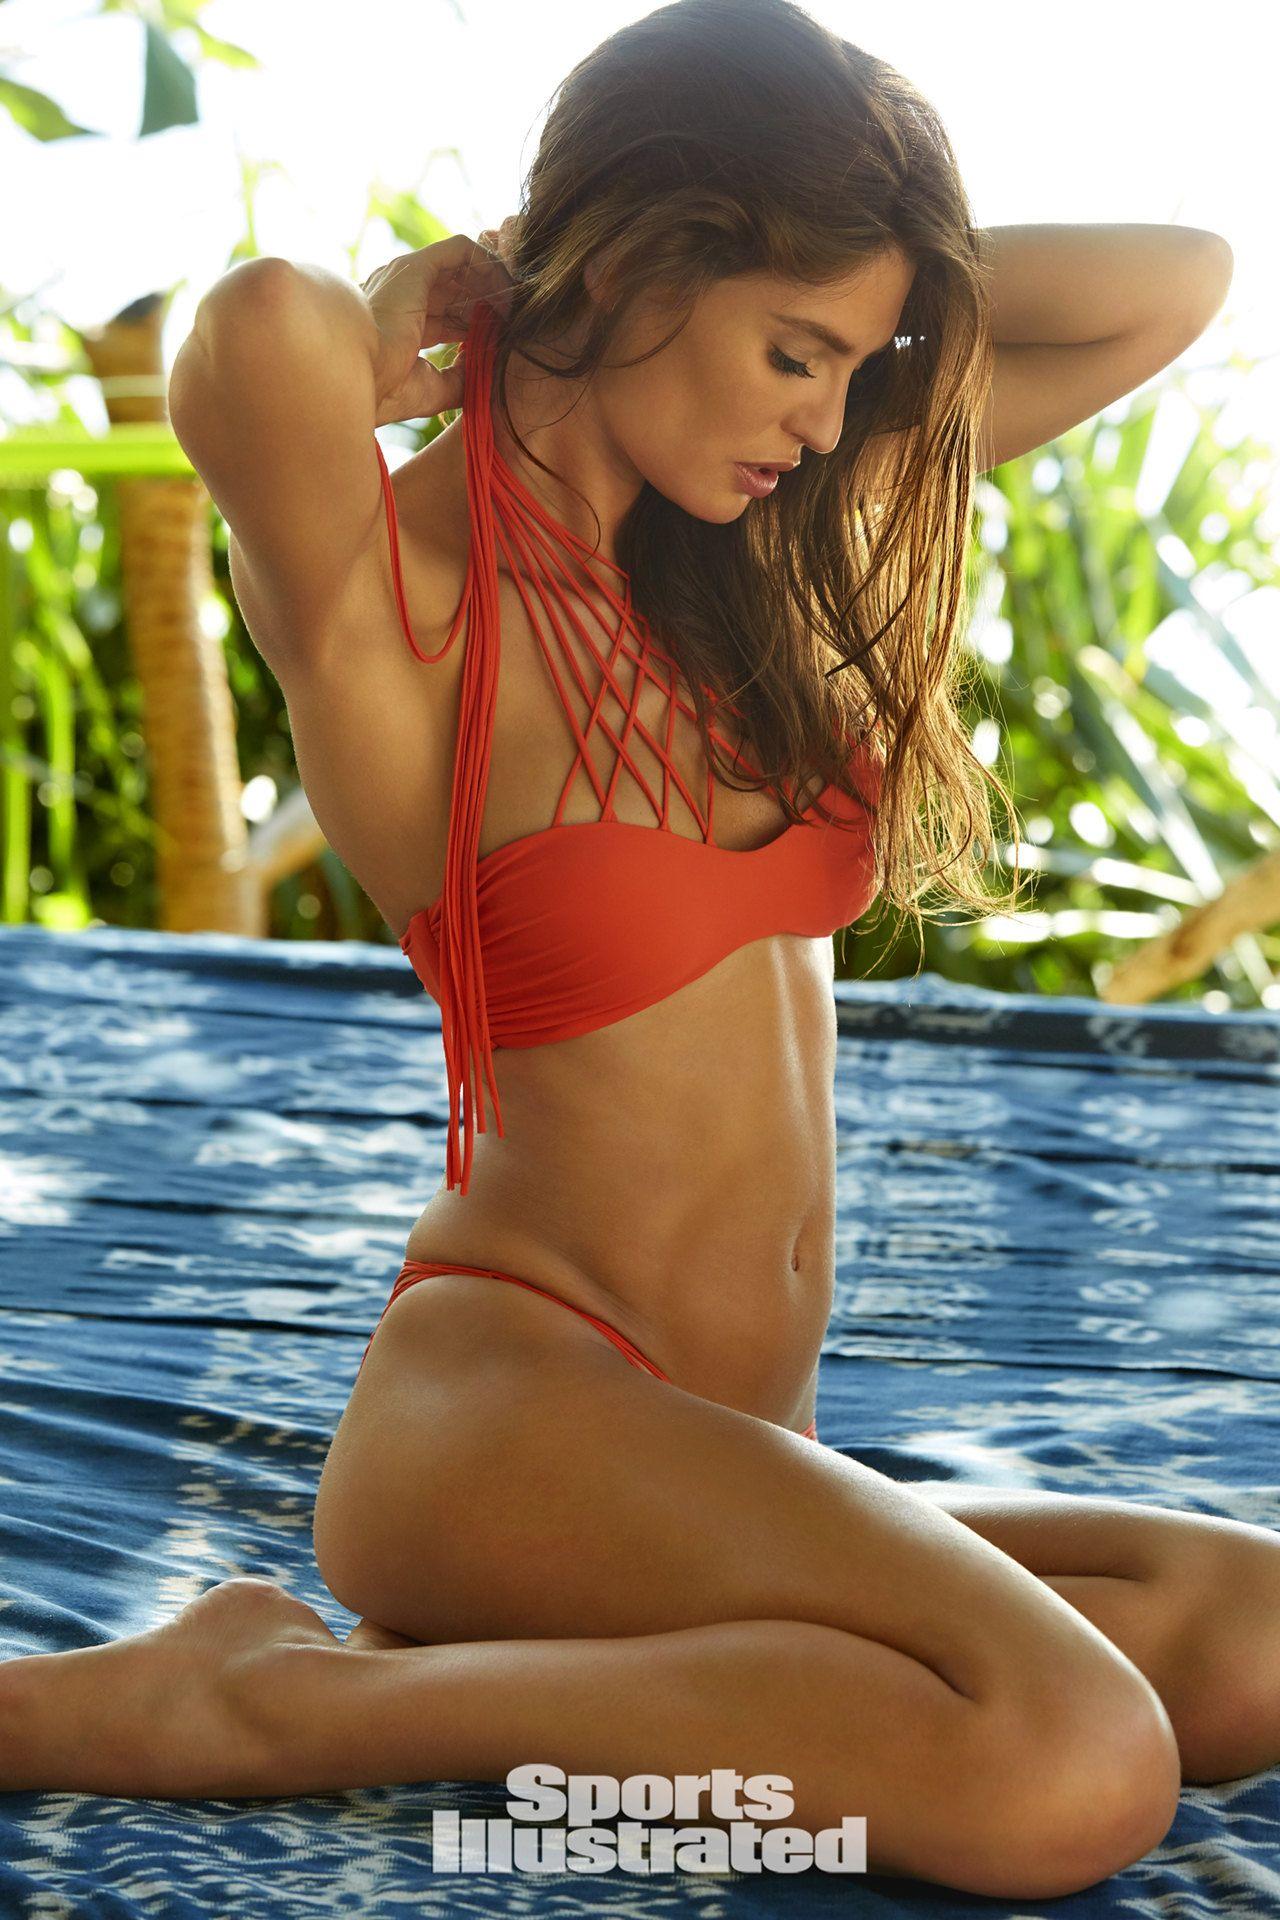 Bianca Bikini Model 78